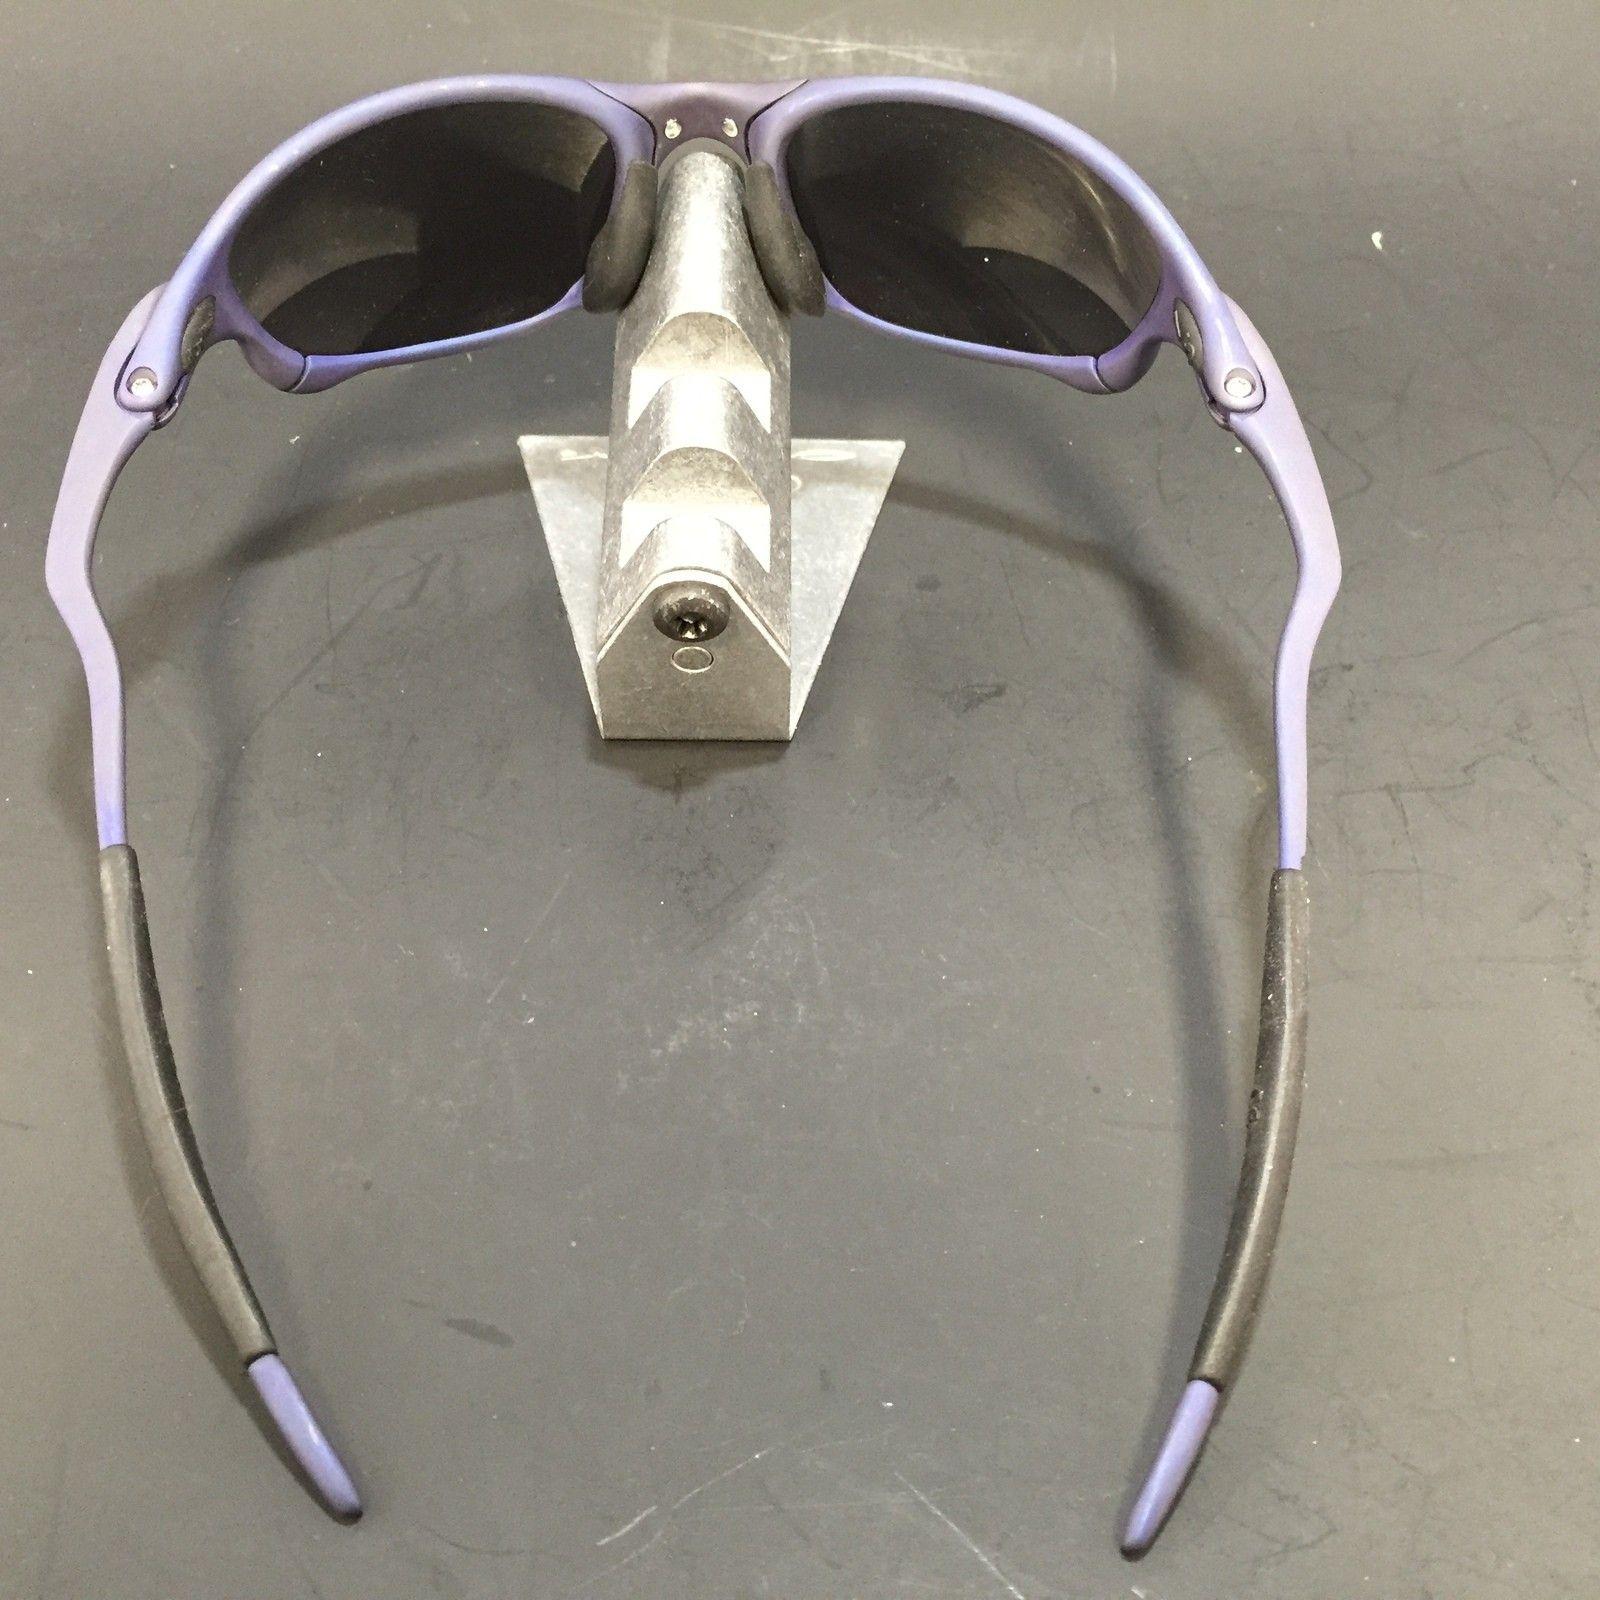 Anodized Purple X-Metal Finish XX Frame w/ OEM New Black Lenses - IMG_1853.JPG